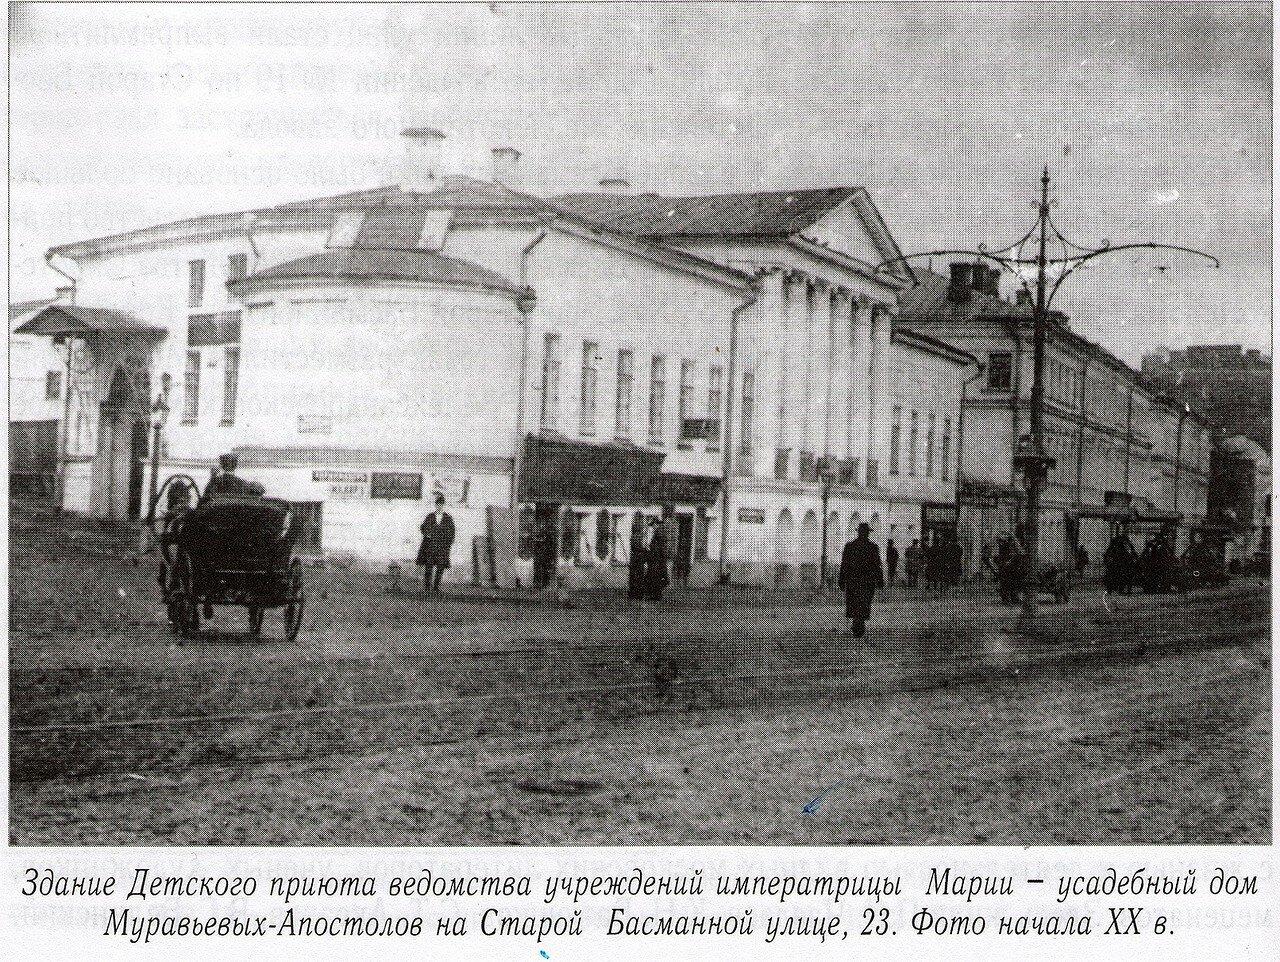 https://img-fotki.yandex.ru/get/397894/199368979.18b/0_26e820_28312195_XXXL.jpg